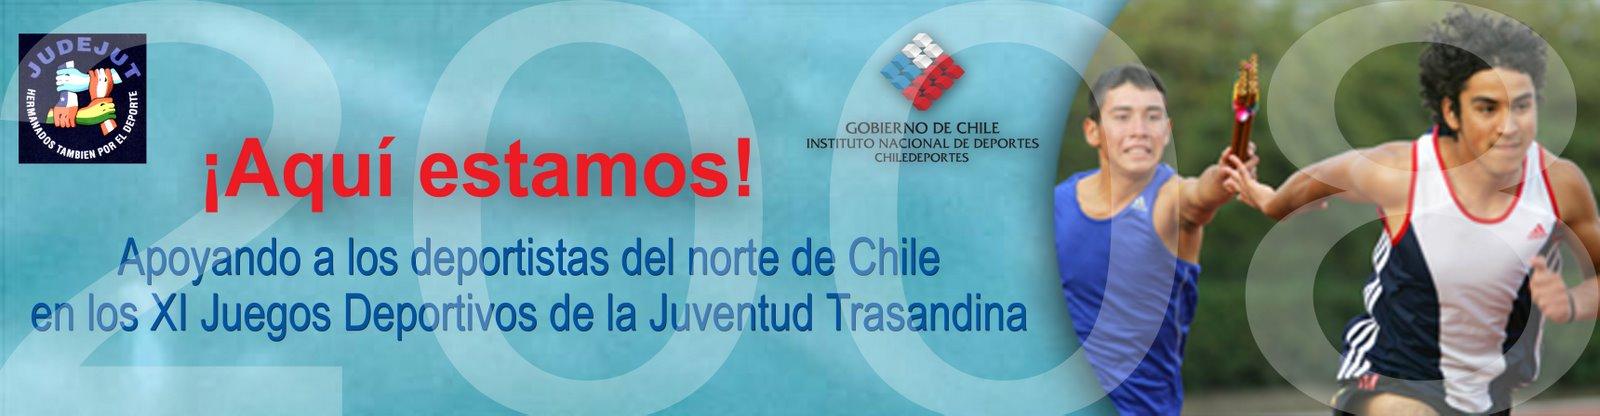 JUDEJUT 2008 - Instituto Nacional de Deportes